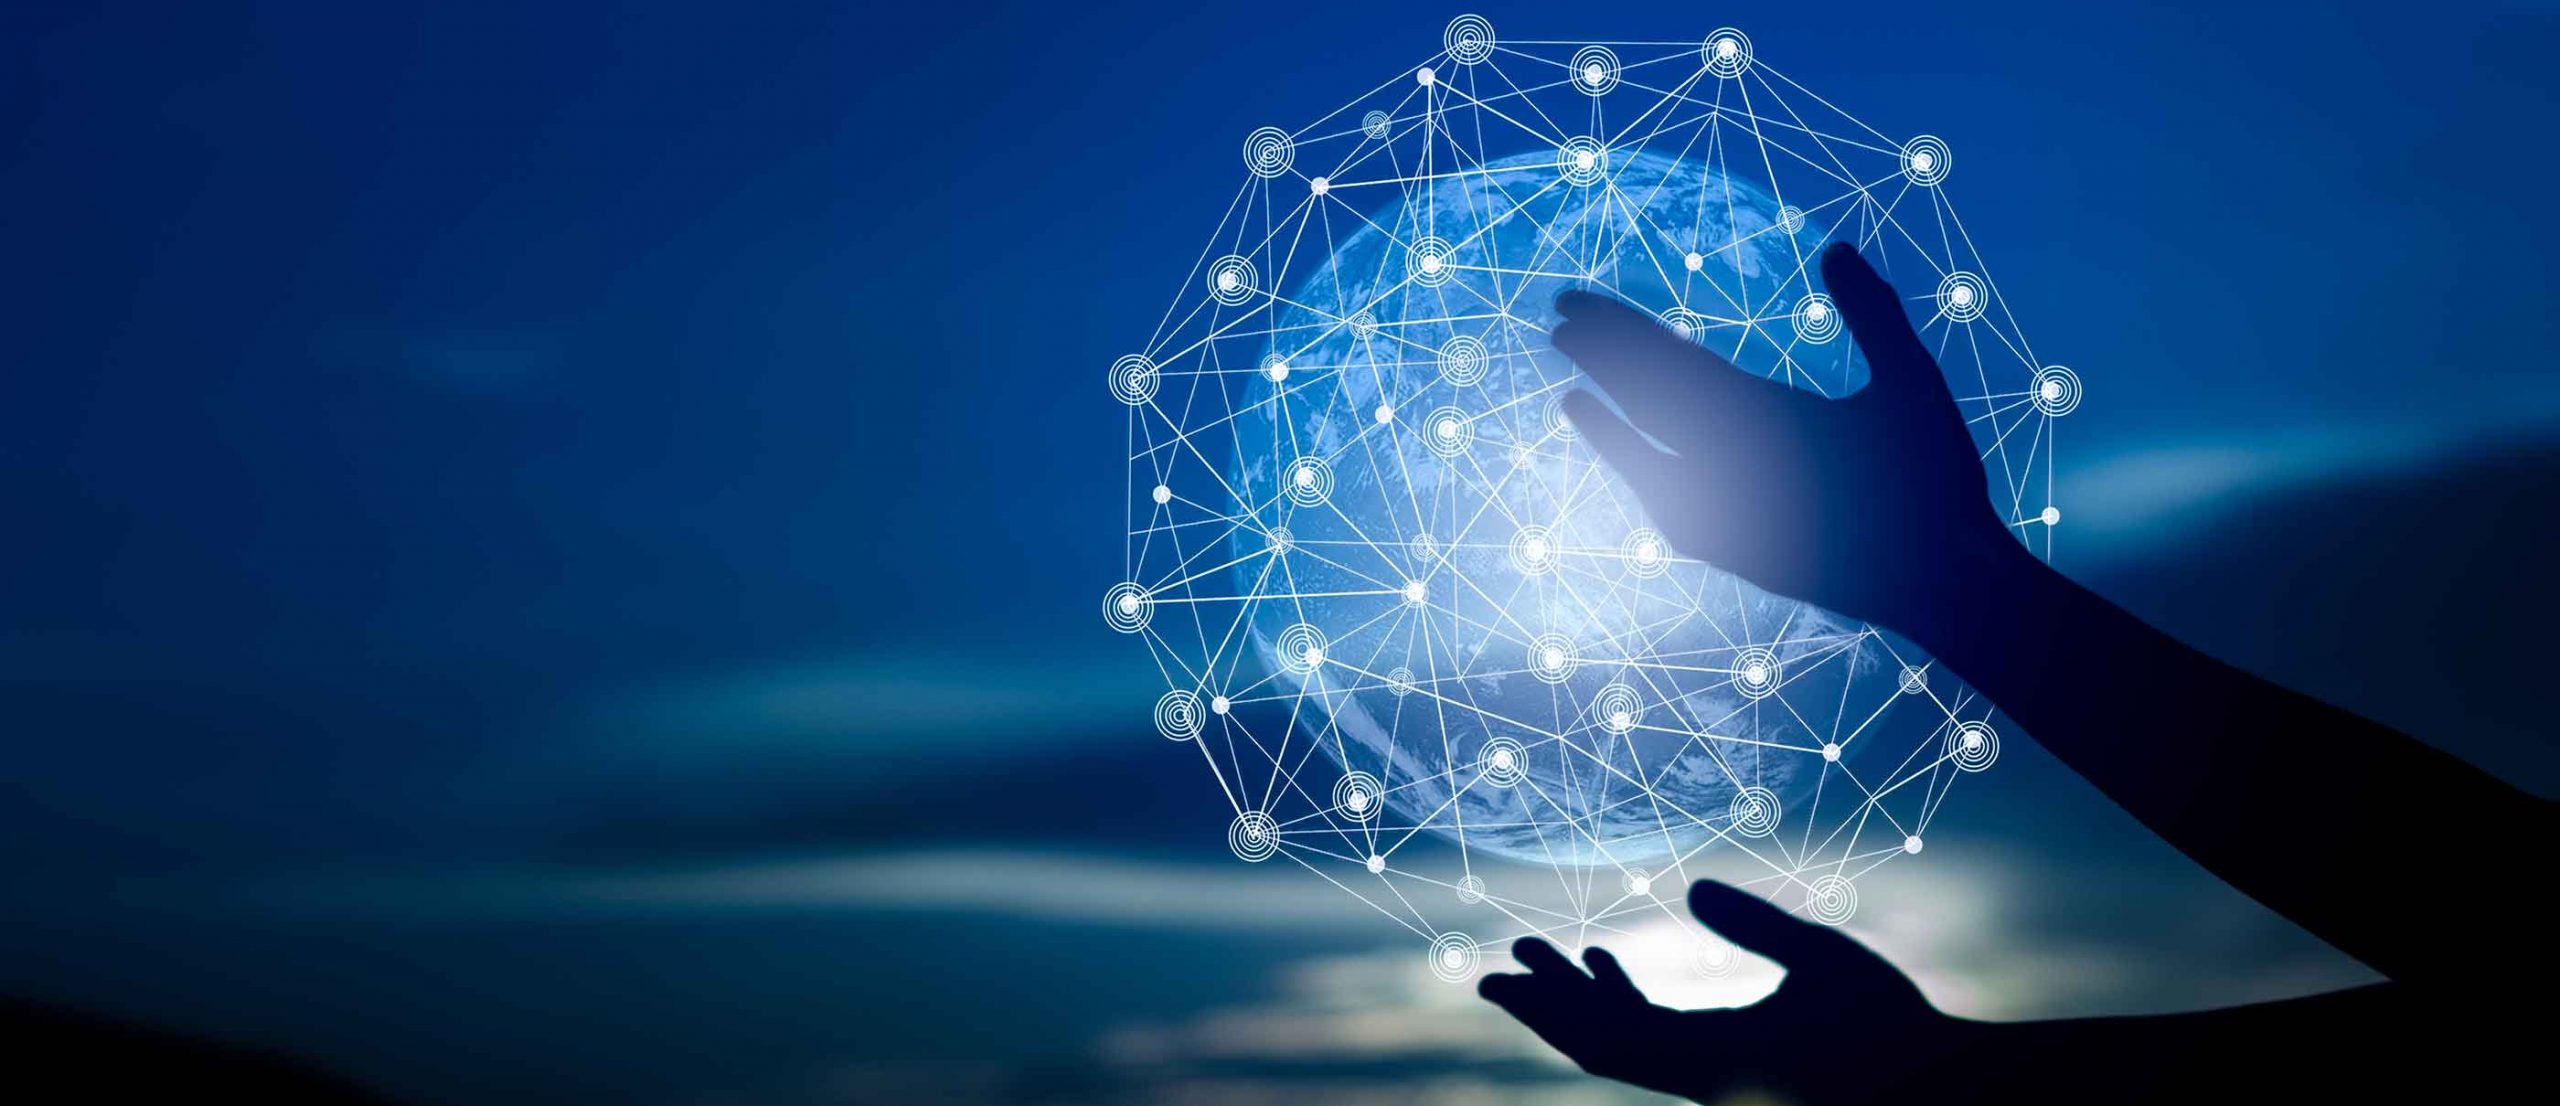 Kaleida: Digital Transformation Accelerating Change Banner